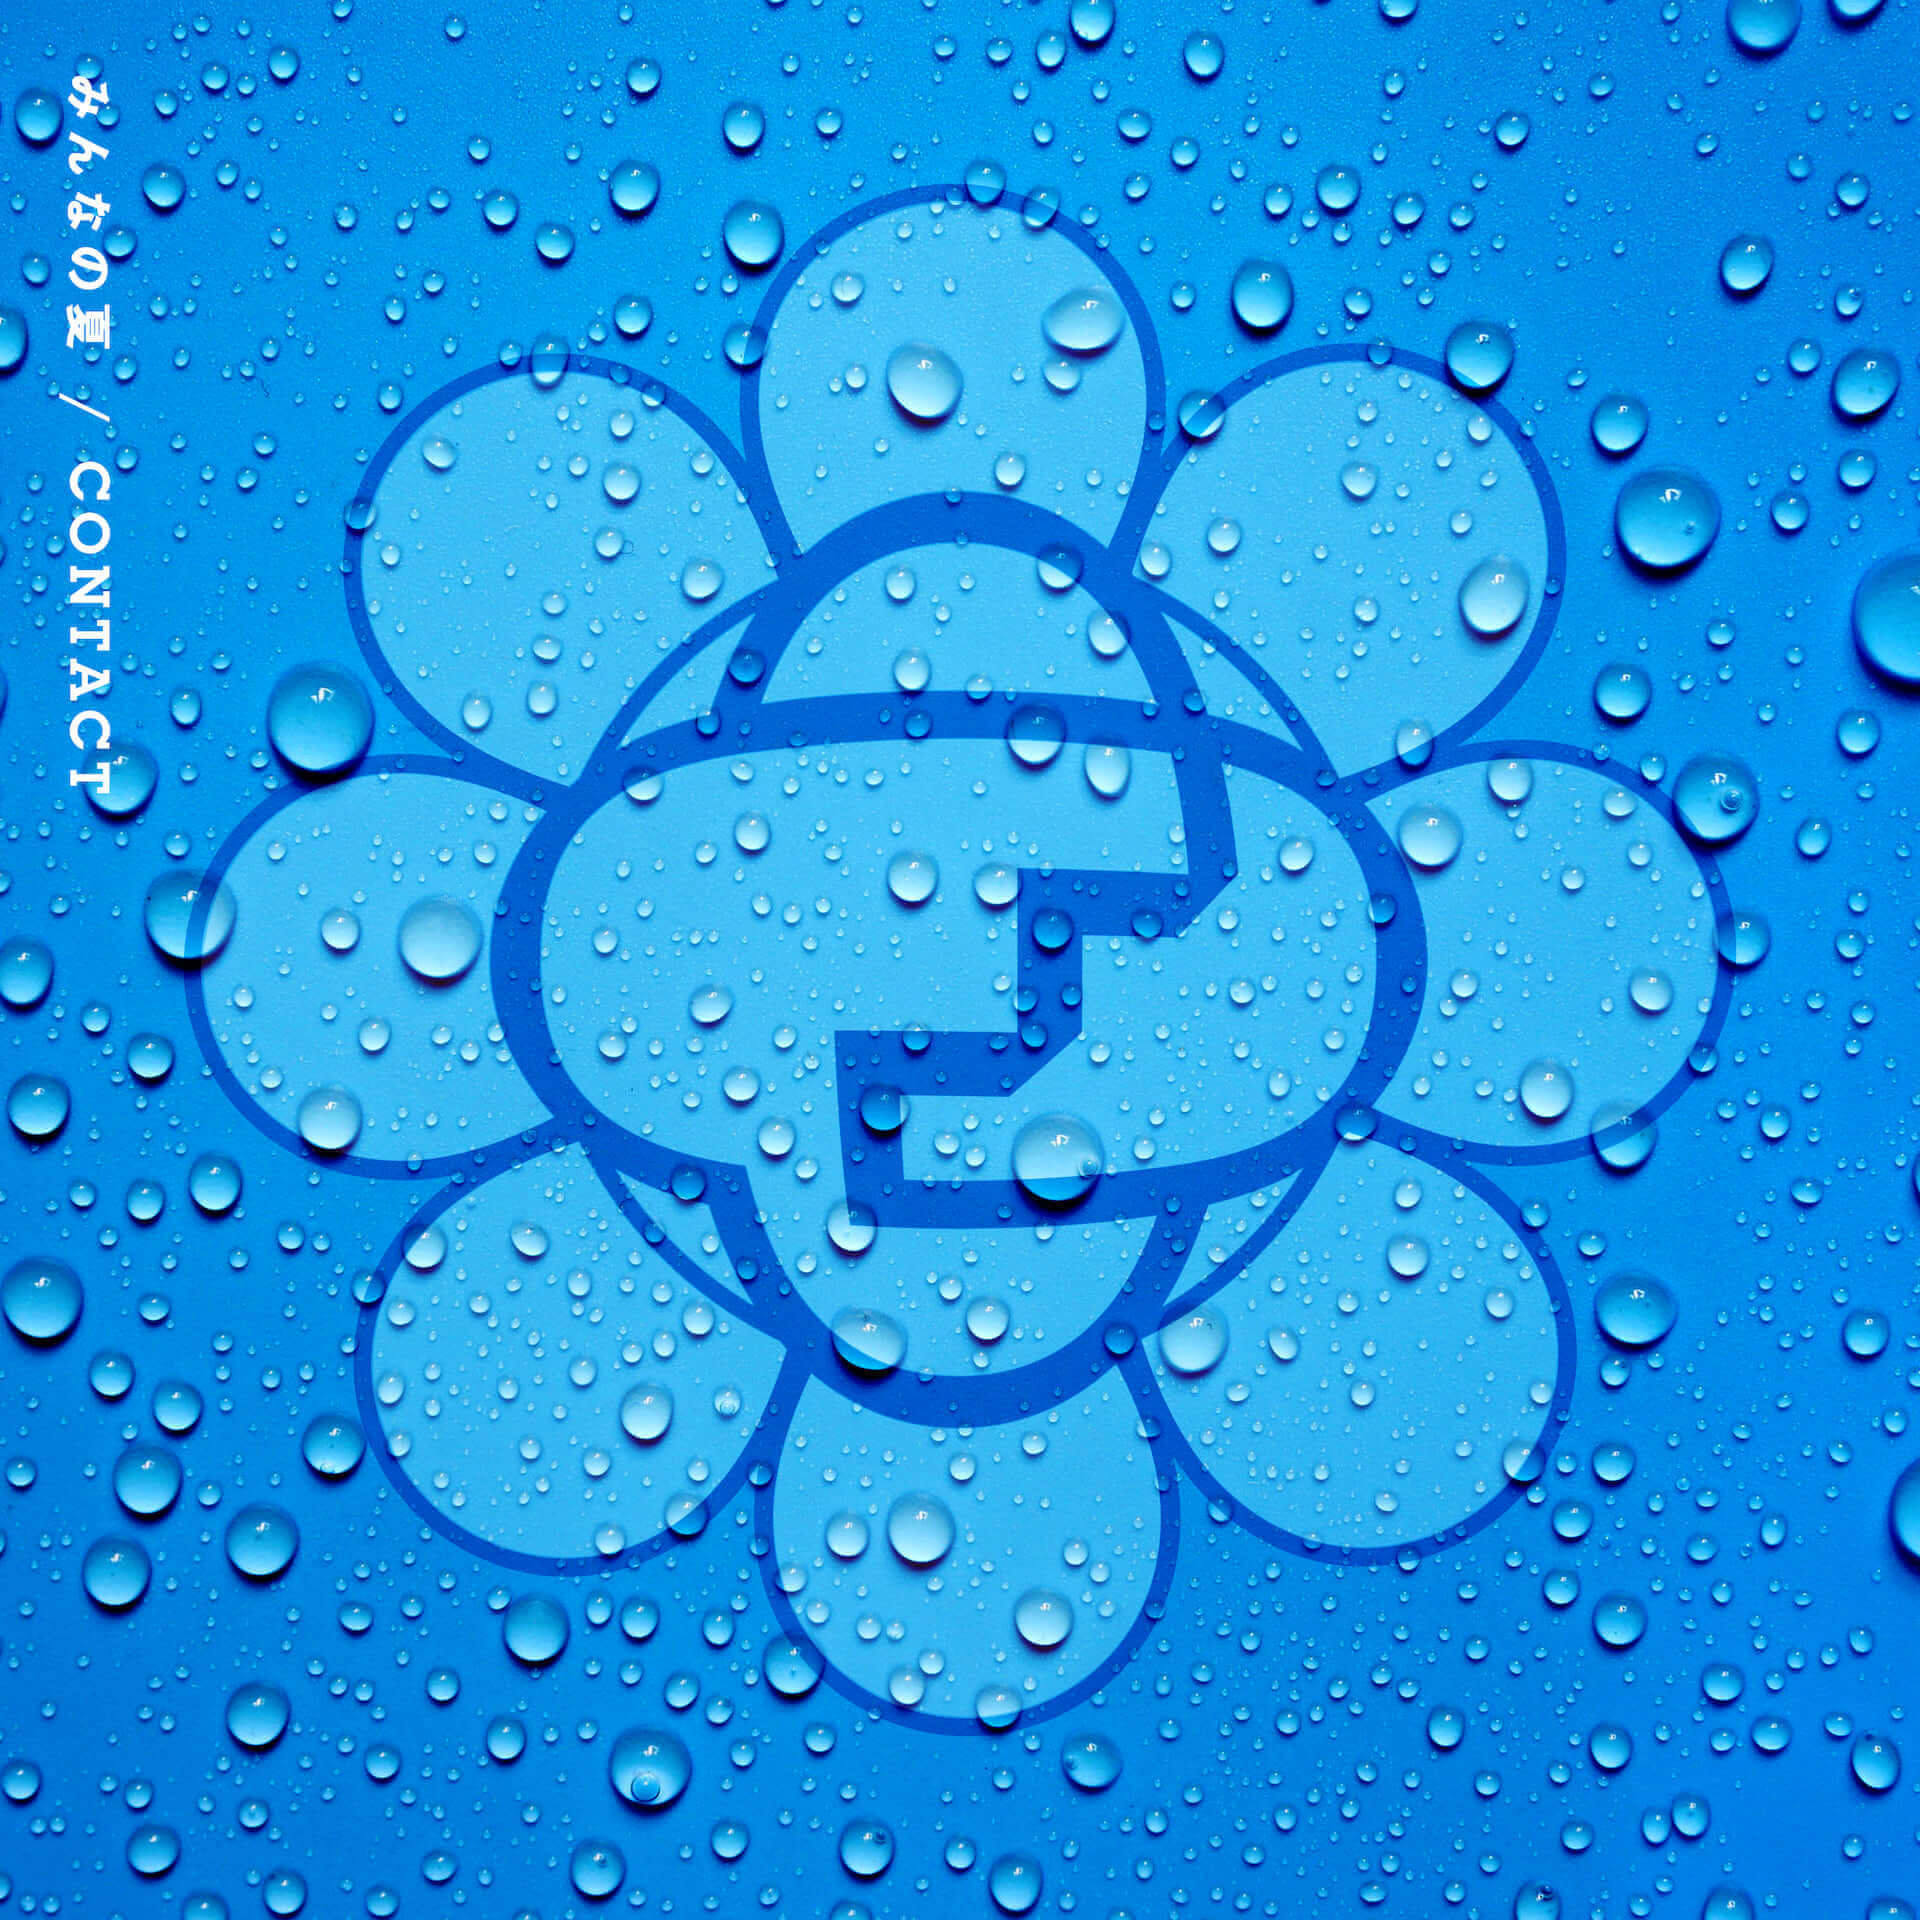 "FNCYが最新曲""みんなの夏""のMVを公開!grooveman Spot、KASHIFも登場|RKによる最新写真も解禁 music200805_fncy_20-1920x1920"